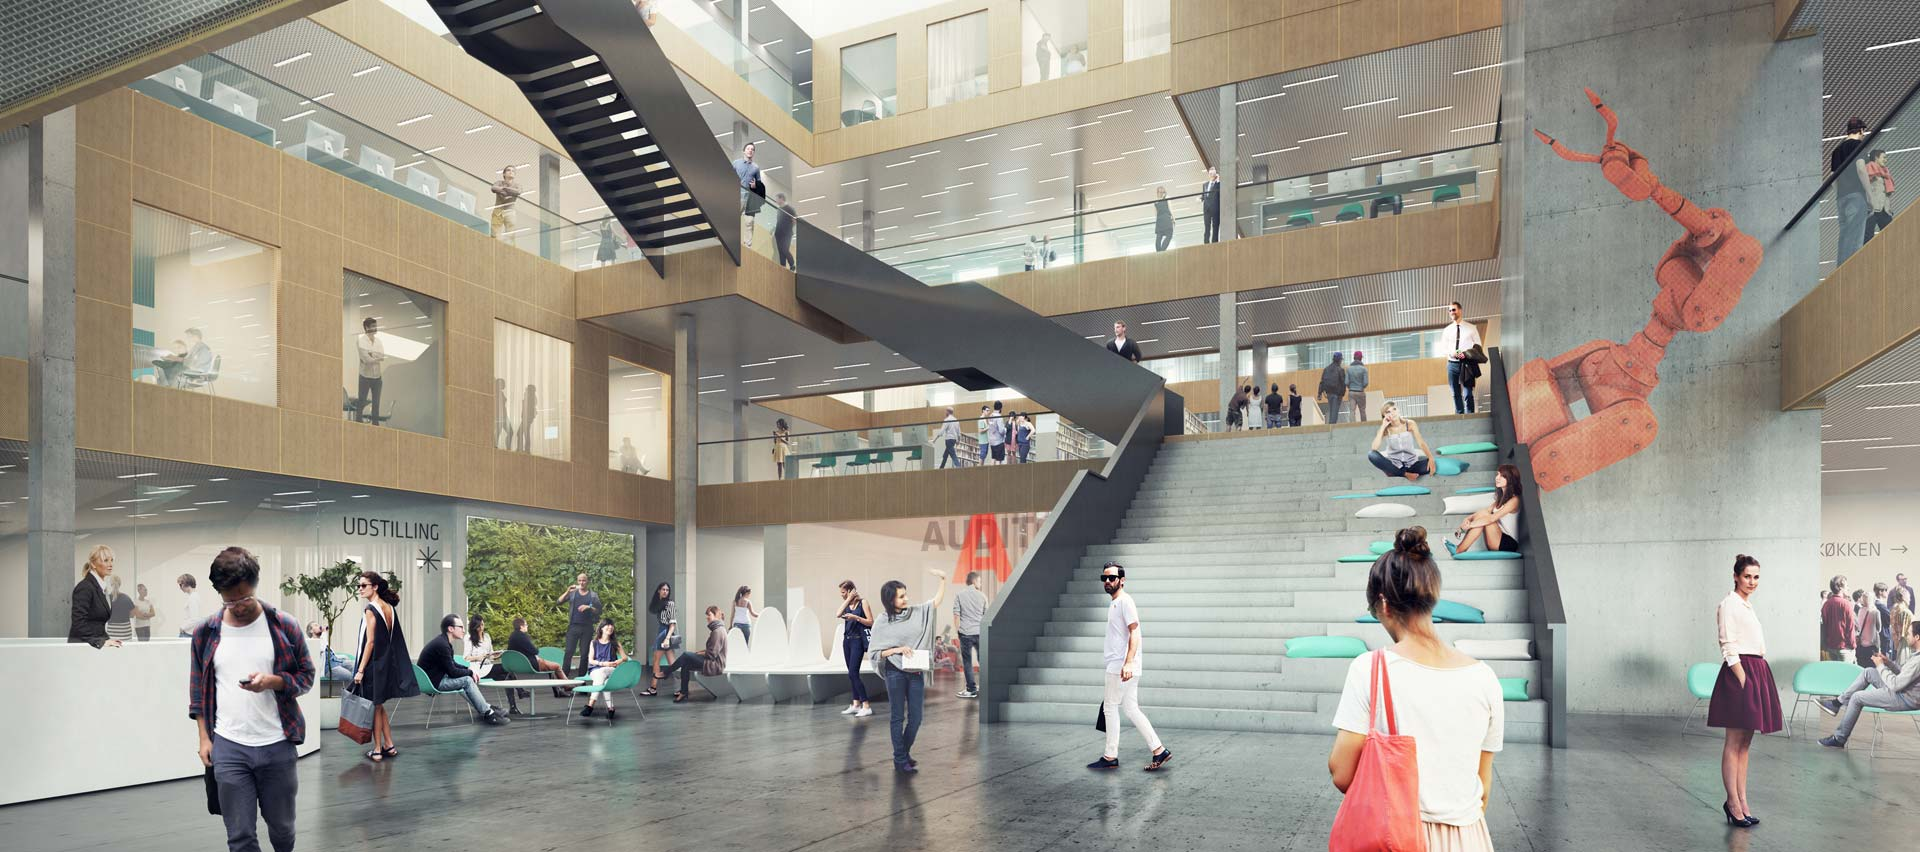 erhvervsakademi-lillebaelt_henning-larsen-architects02